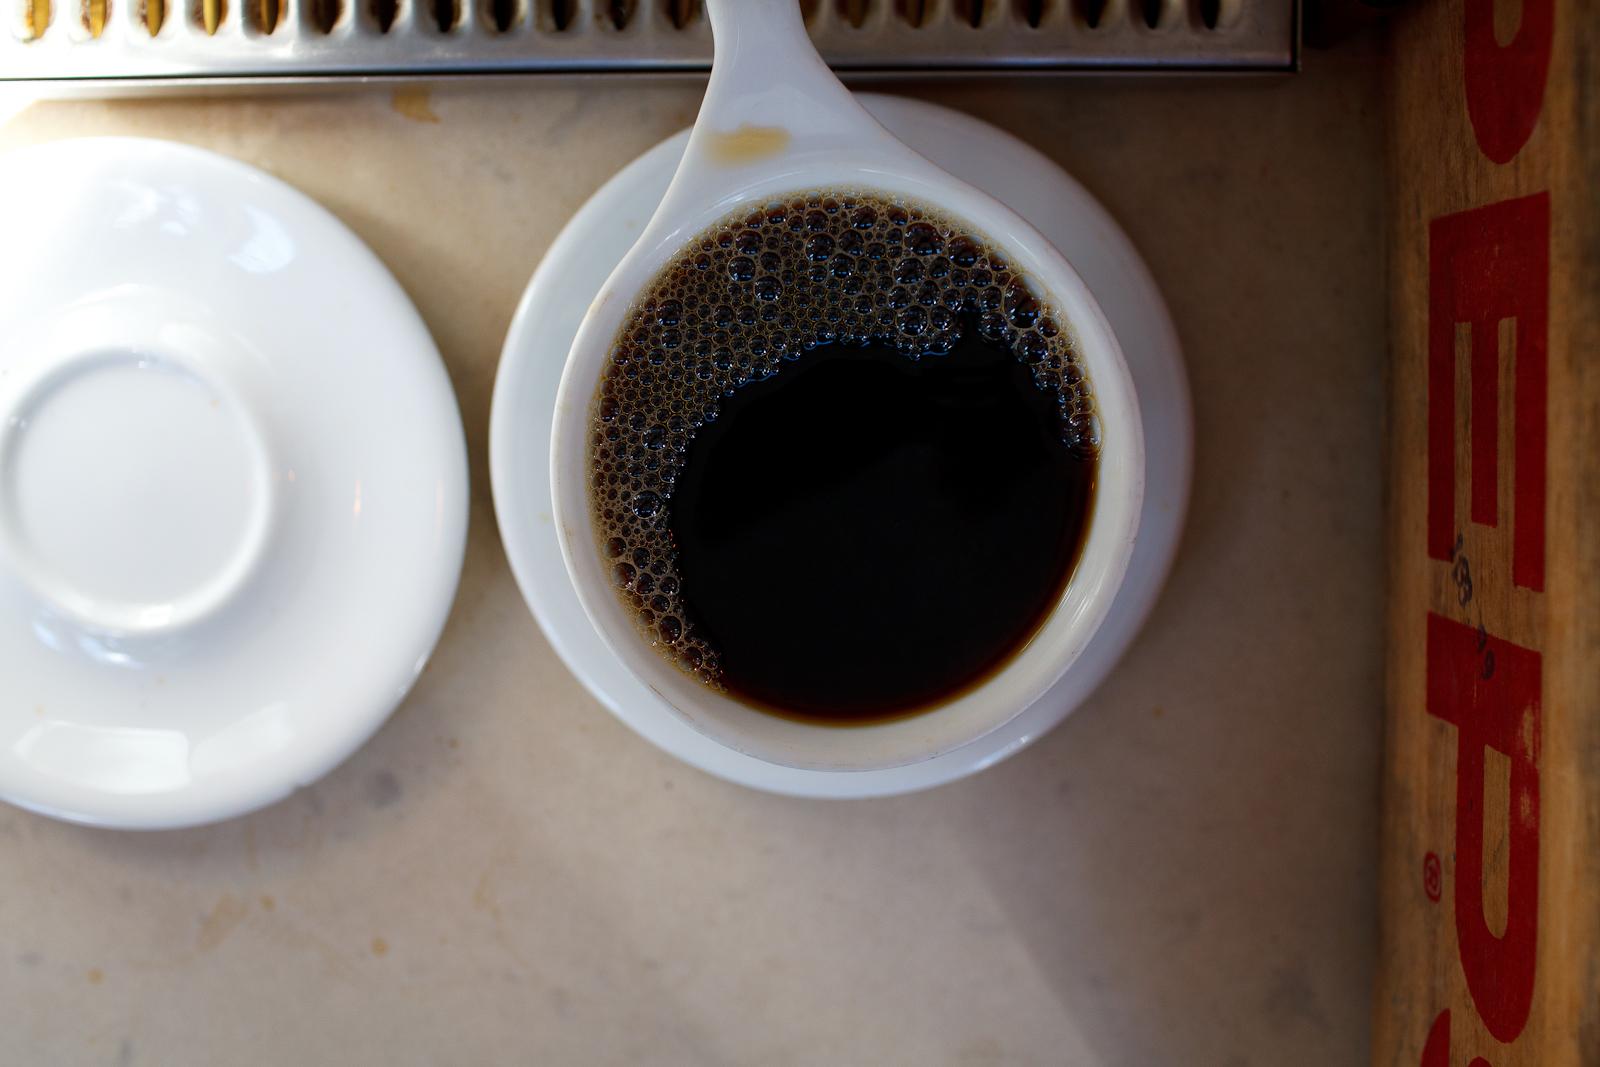 Stumptown pour over coffee ($3.25)